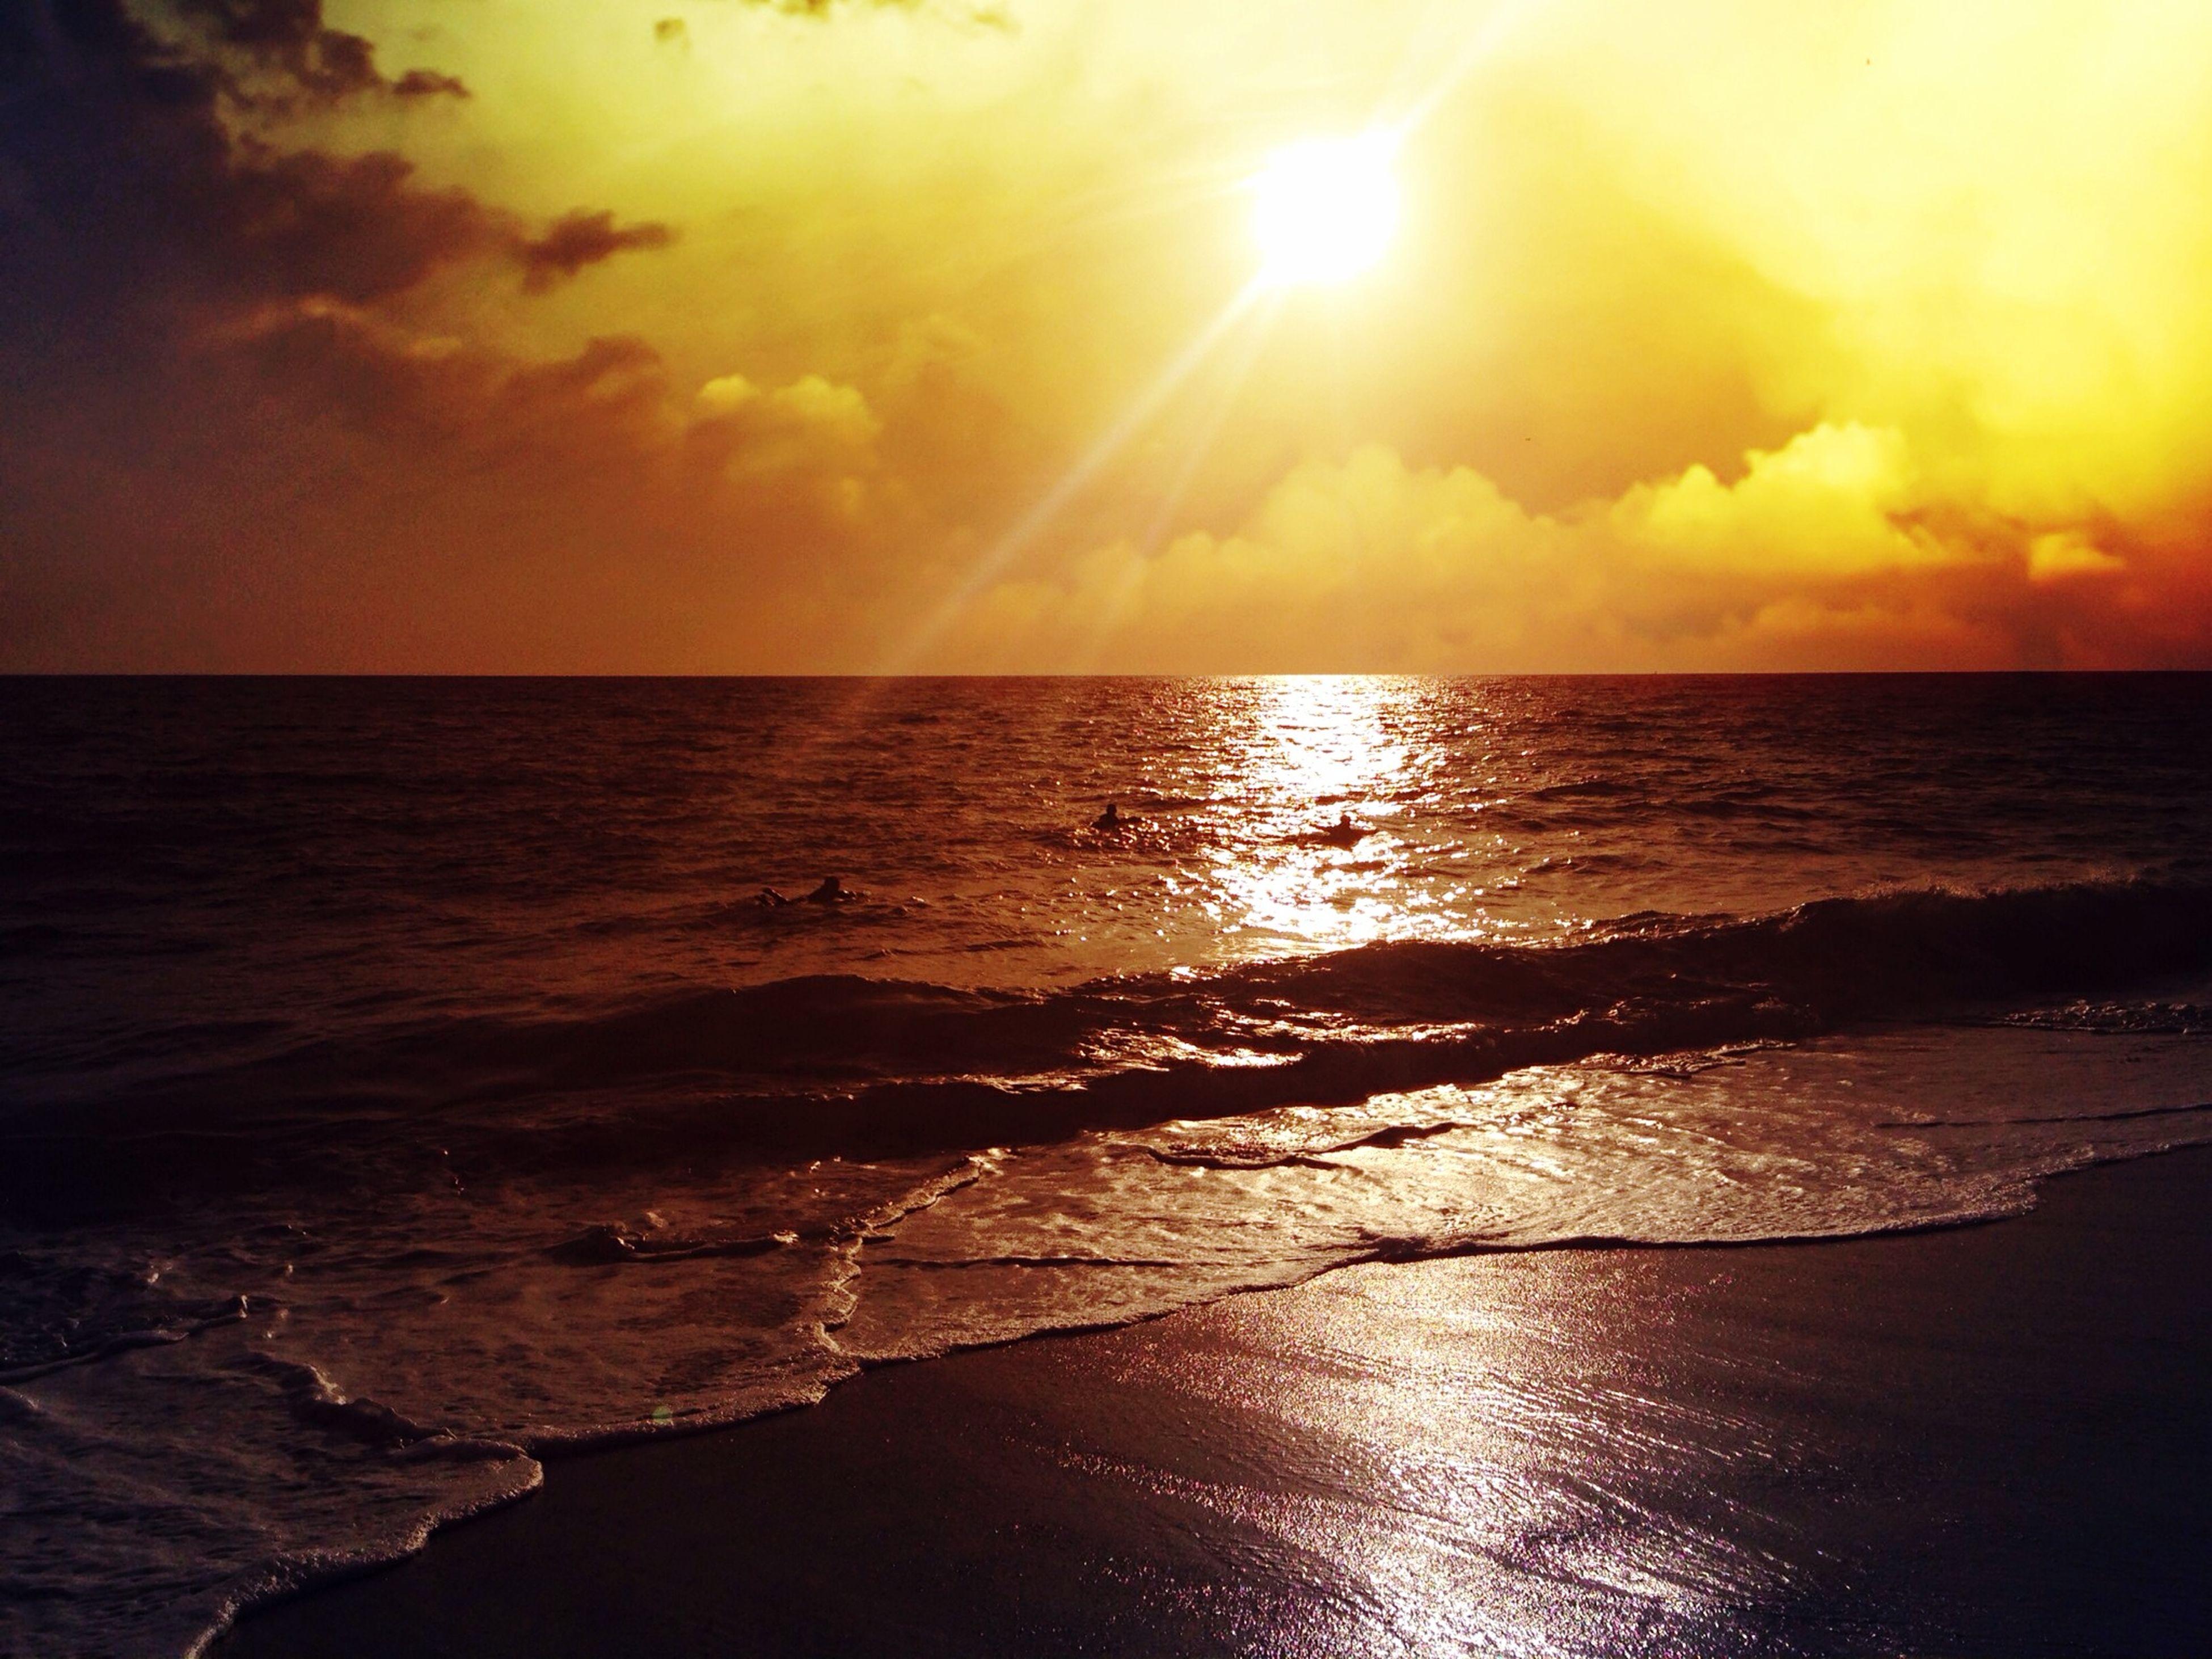 sea, water, horizon over water, sunset, scenics, tranquil scene, sun, beauty in nature, sky, tranquility, reflection, beach, idyllic, orange color, nature, shore, cloud - sky, wave, seascape, sunlight